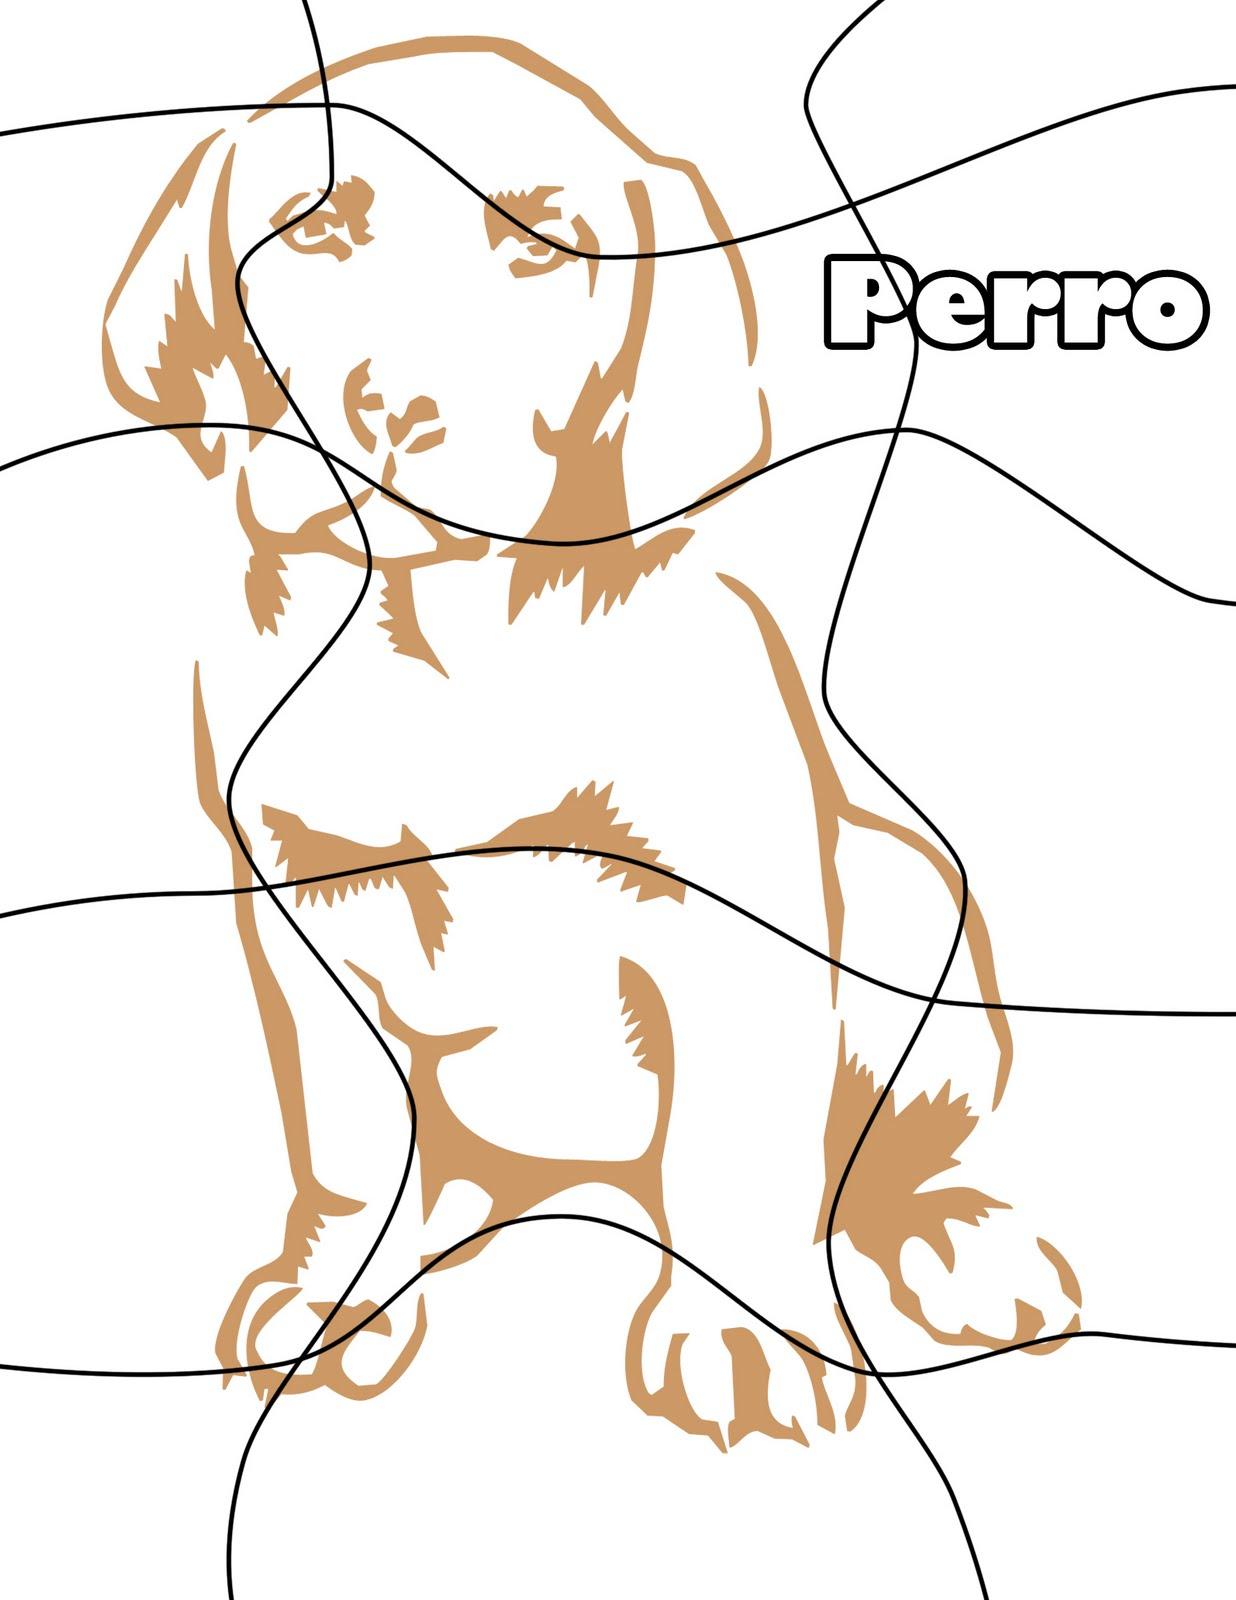 Listo Para imprimir-: Rompecabezas de perro